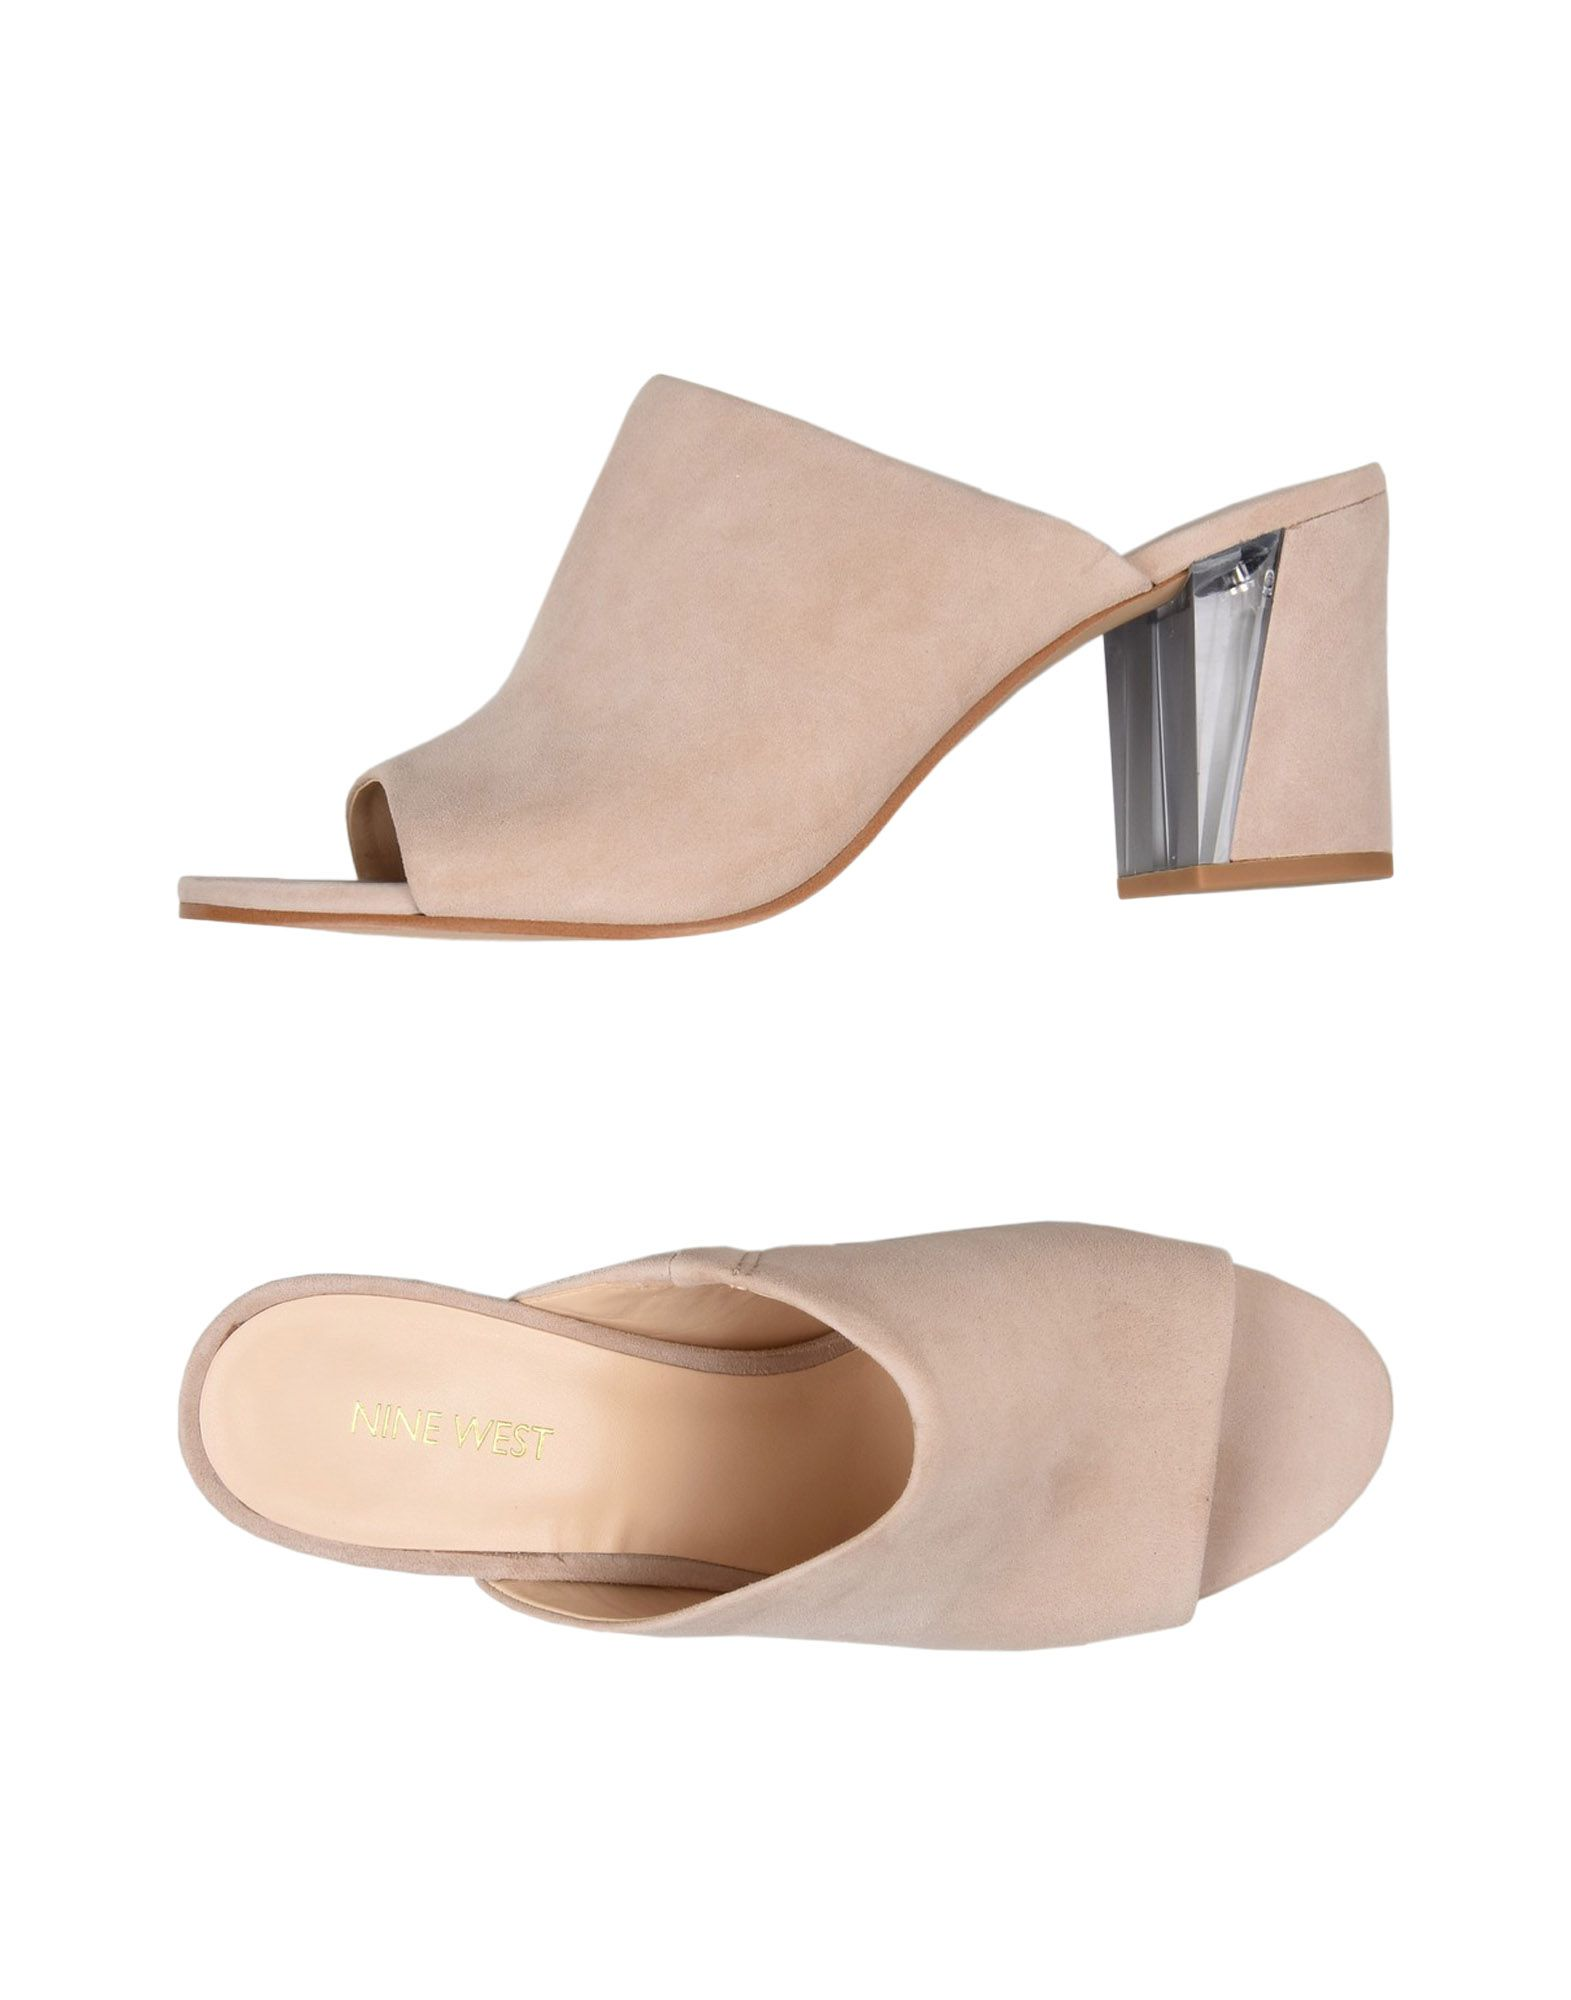 Nine West Sandals - Women Women - Nine West Sandals online on  Canada - 11236527SM e084cc